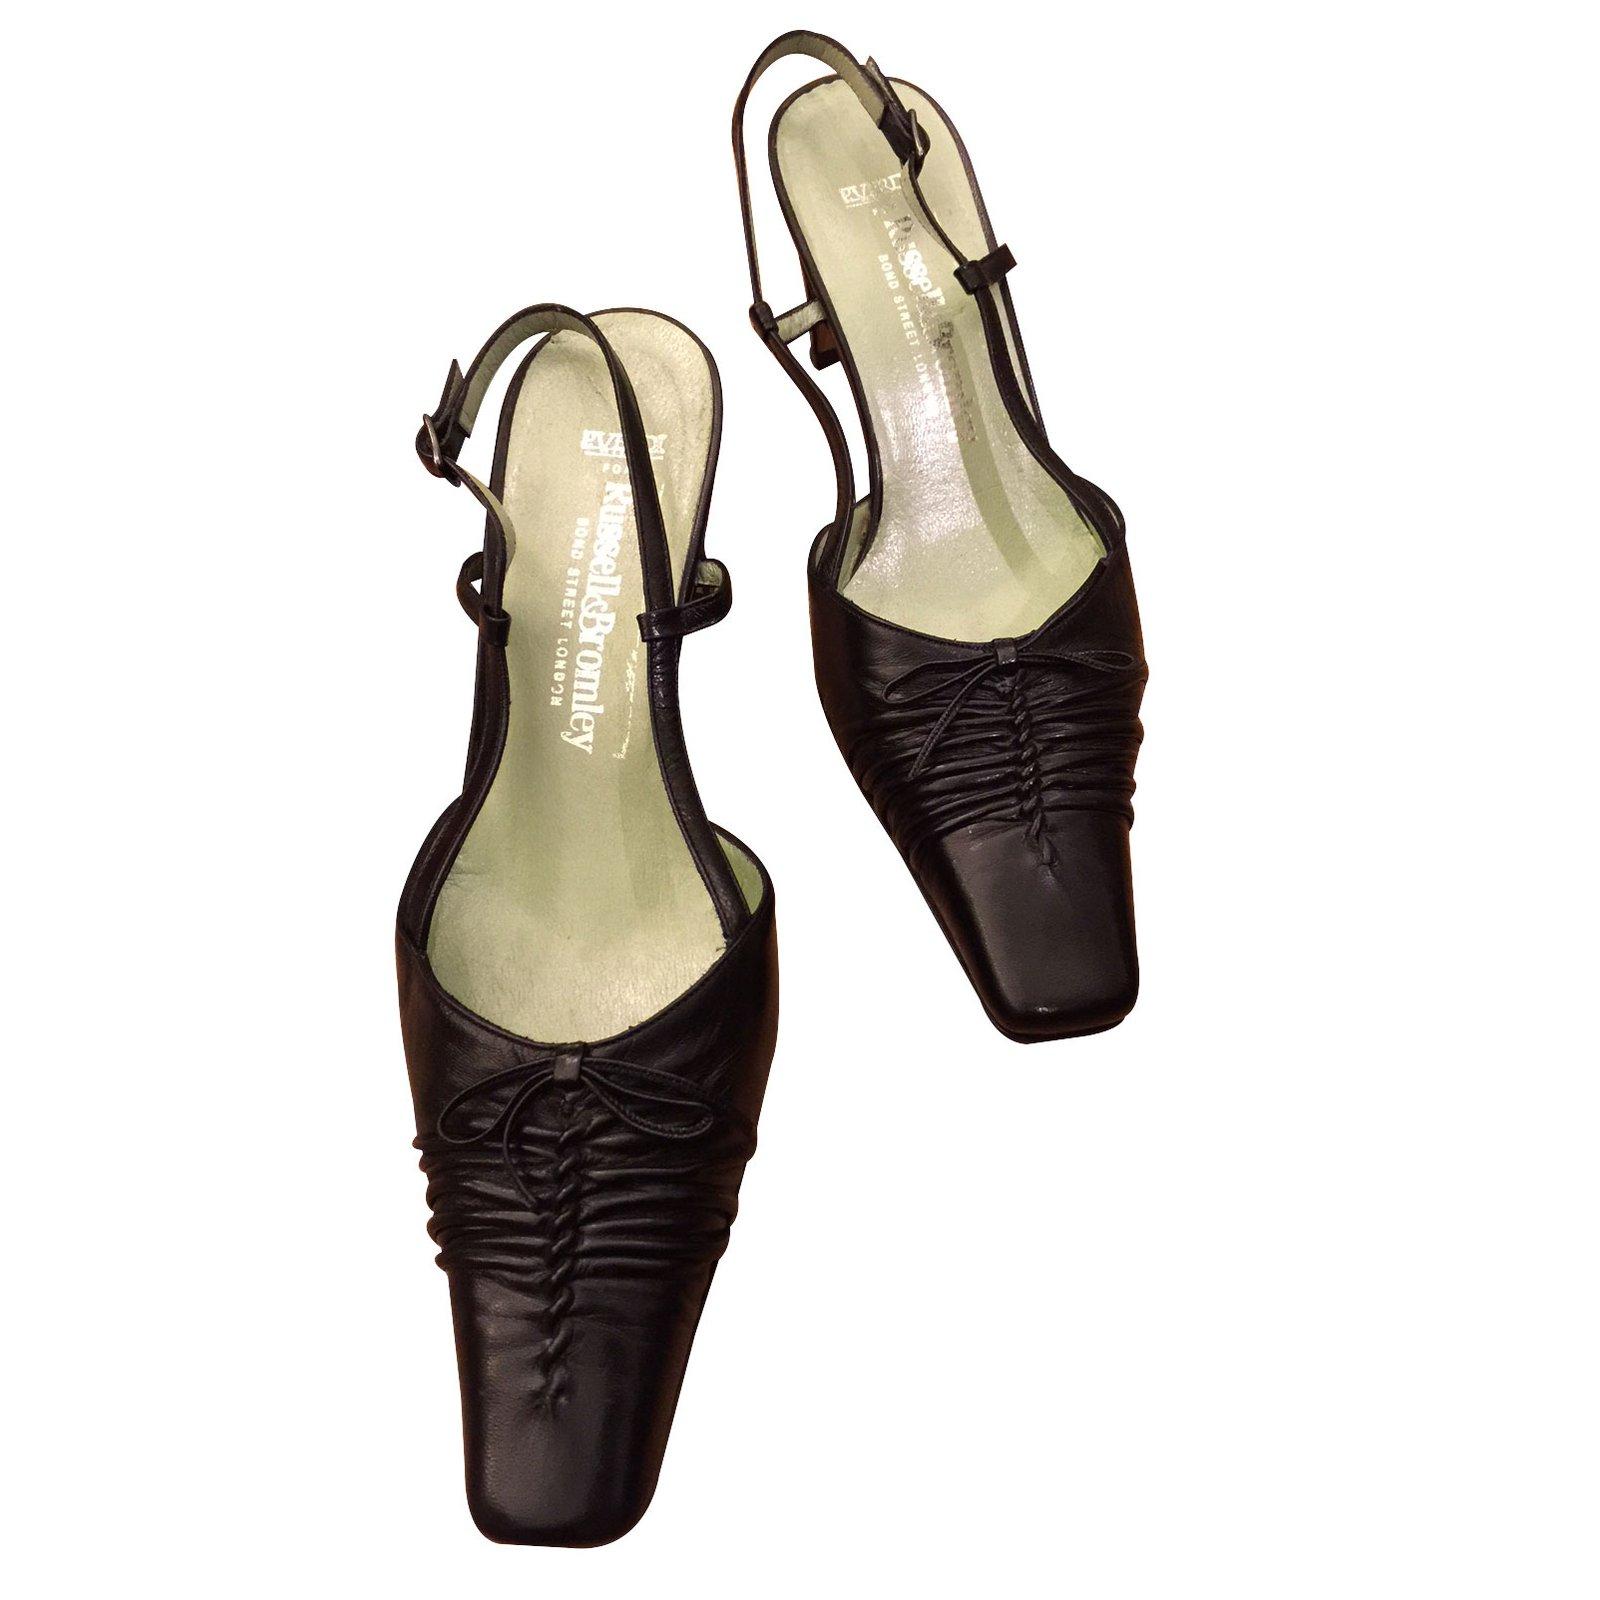 Russell & Bromley Femmes: élégant Russell & Bromley